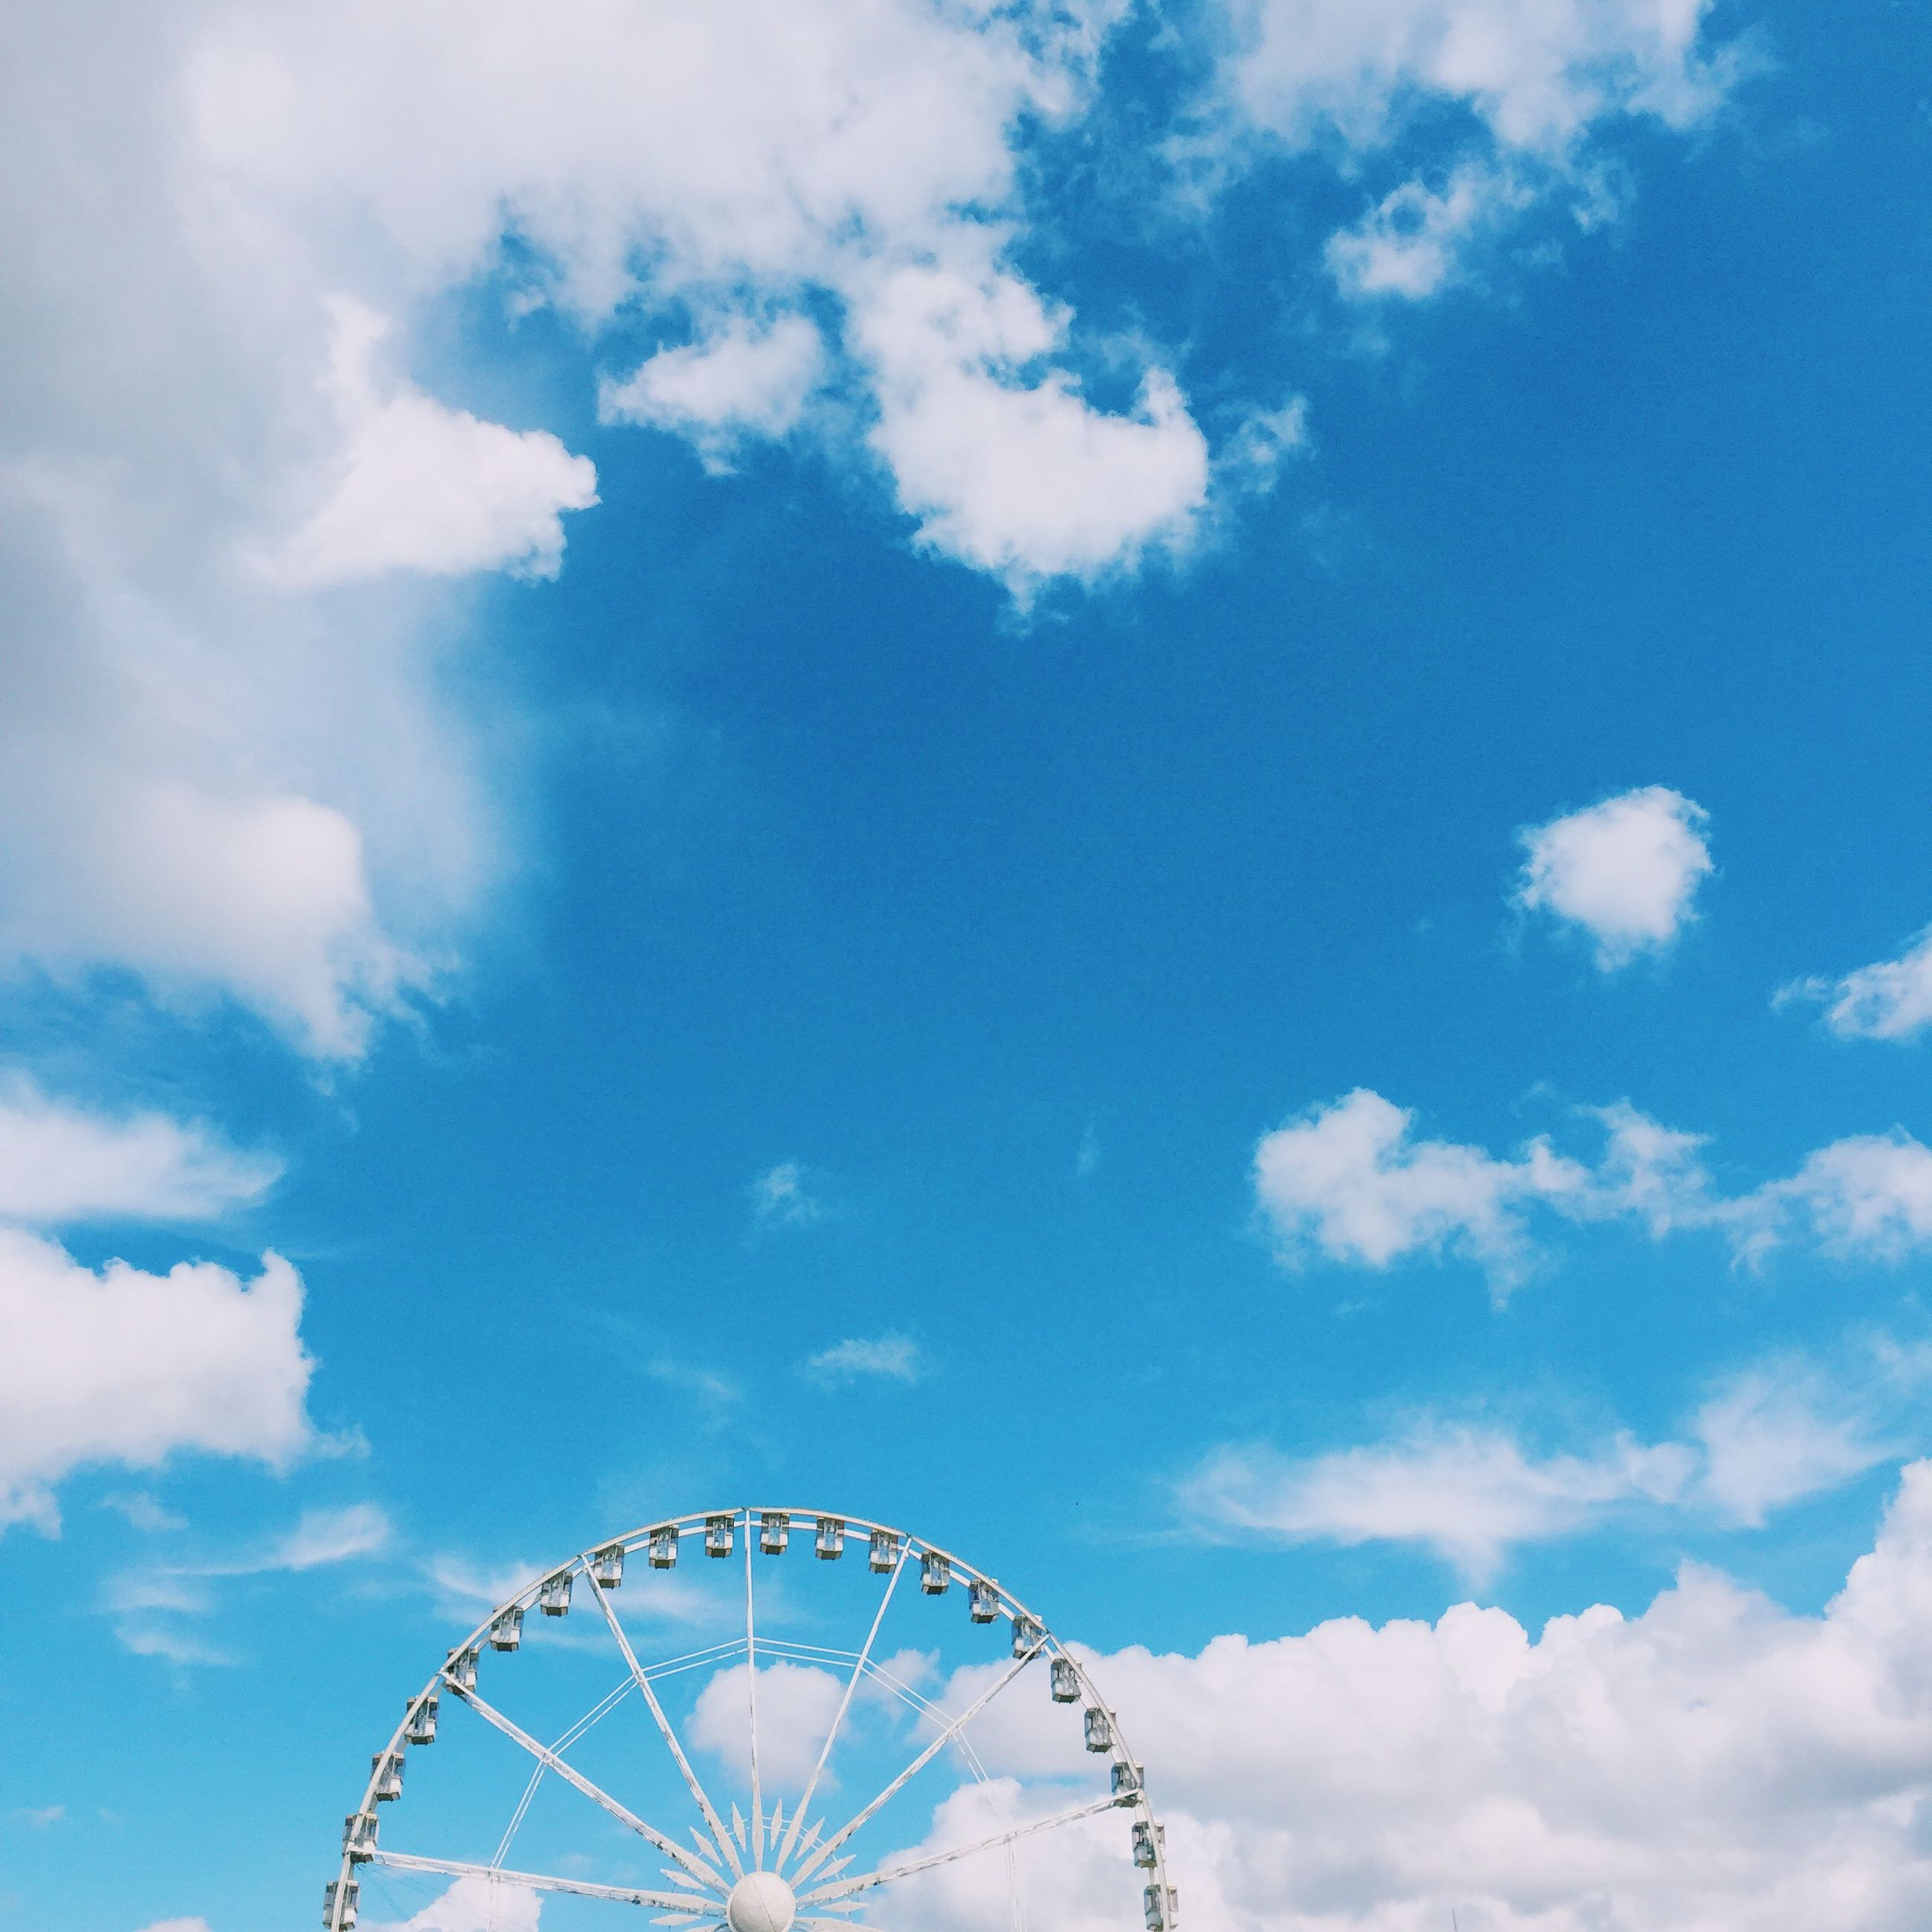 sky, low angle view, ferris wheel, amusement park, amusement park ride, cloud - sky, arts culture and entertainment, blue, cloud, cloudy, circle, day, fun, outdoors, pattern, no people, nature, metal, leisure activity, enjoyment